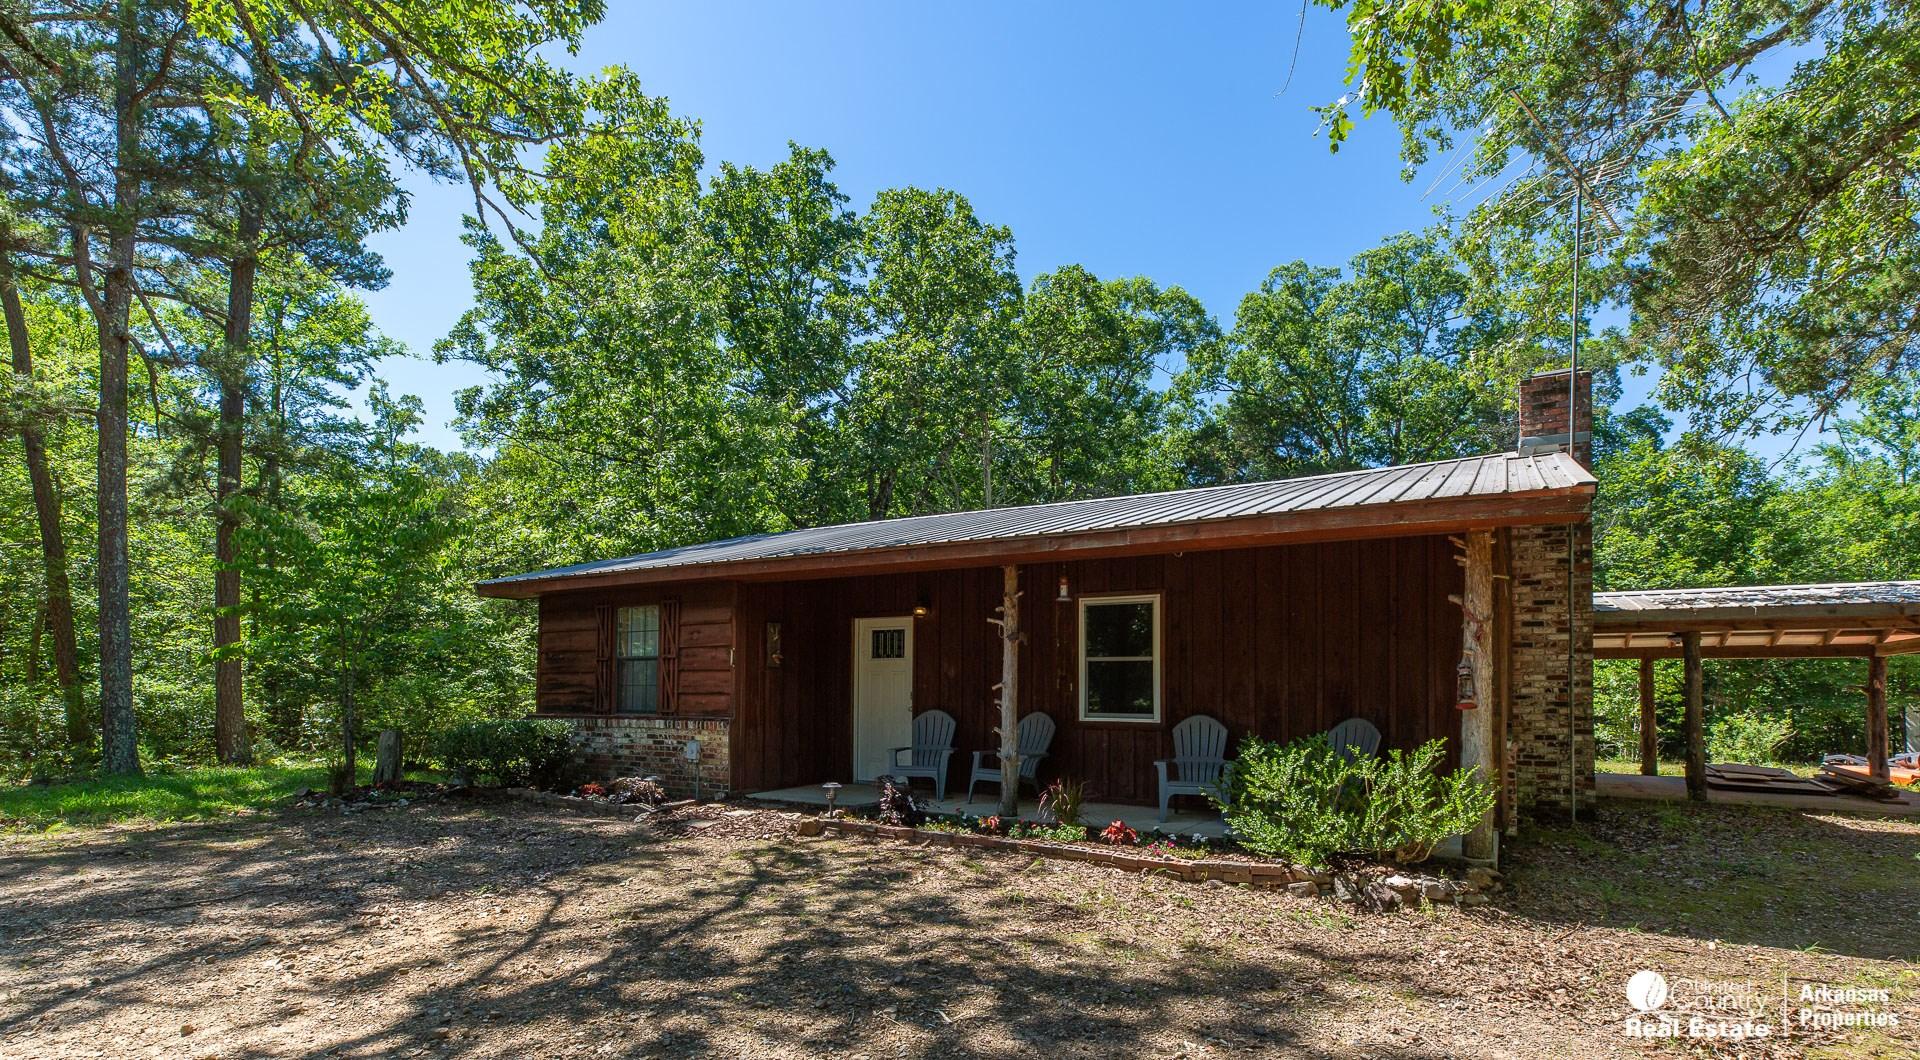 Cabin on 65 acres in Arkansas